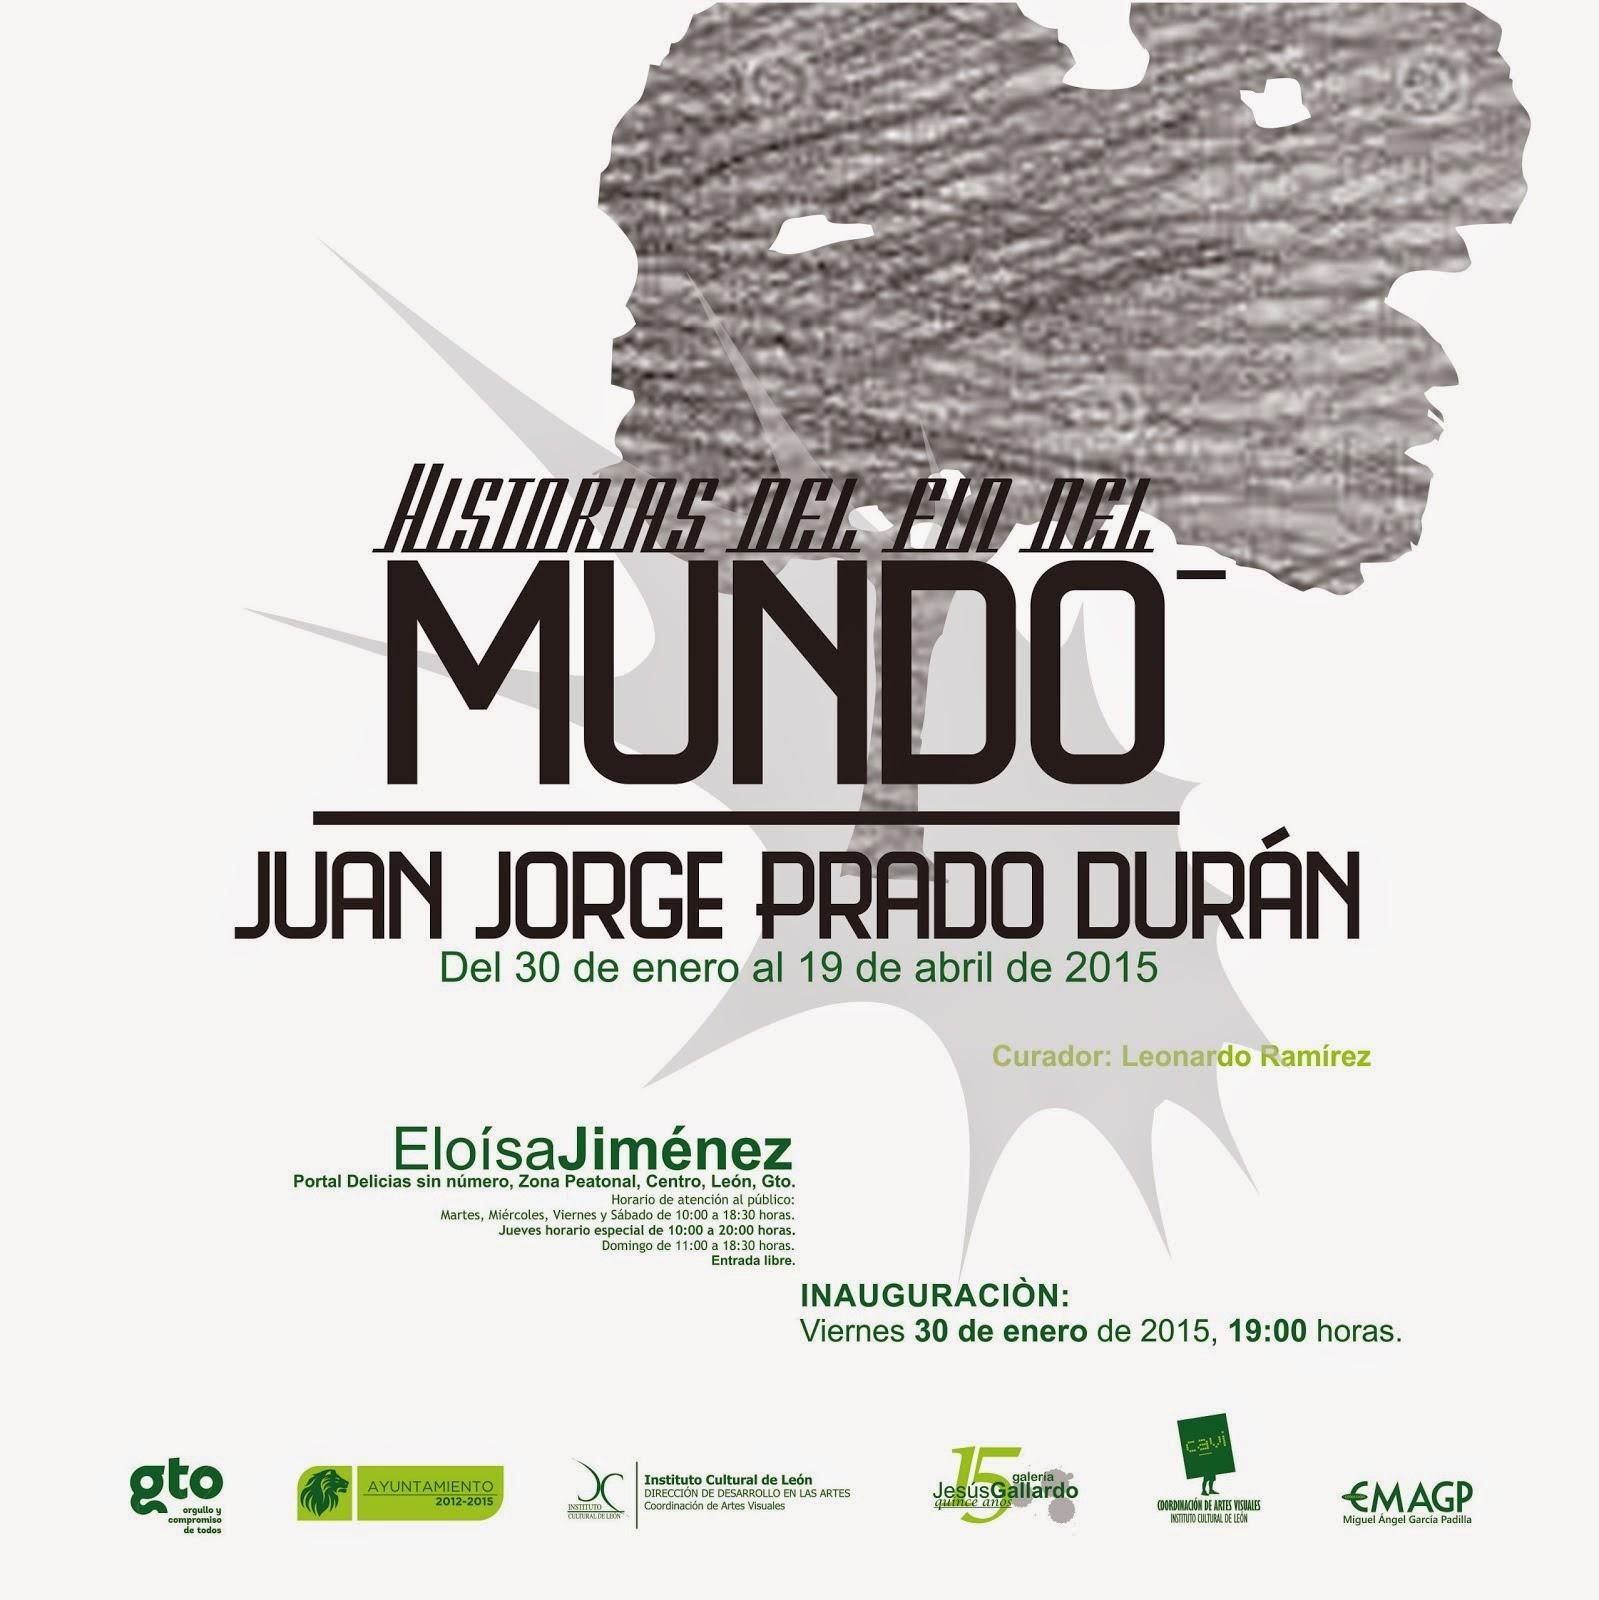 Historias del fin del Mundo, Juan Jorge Prado